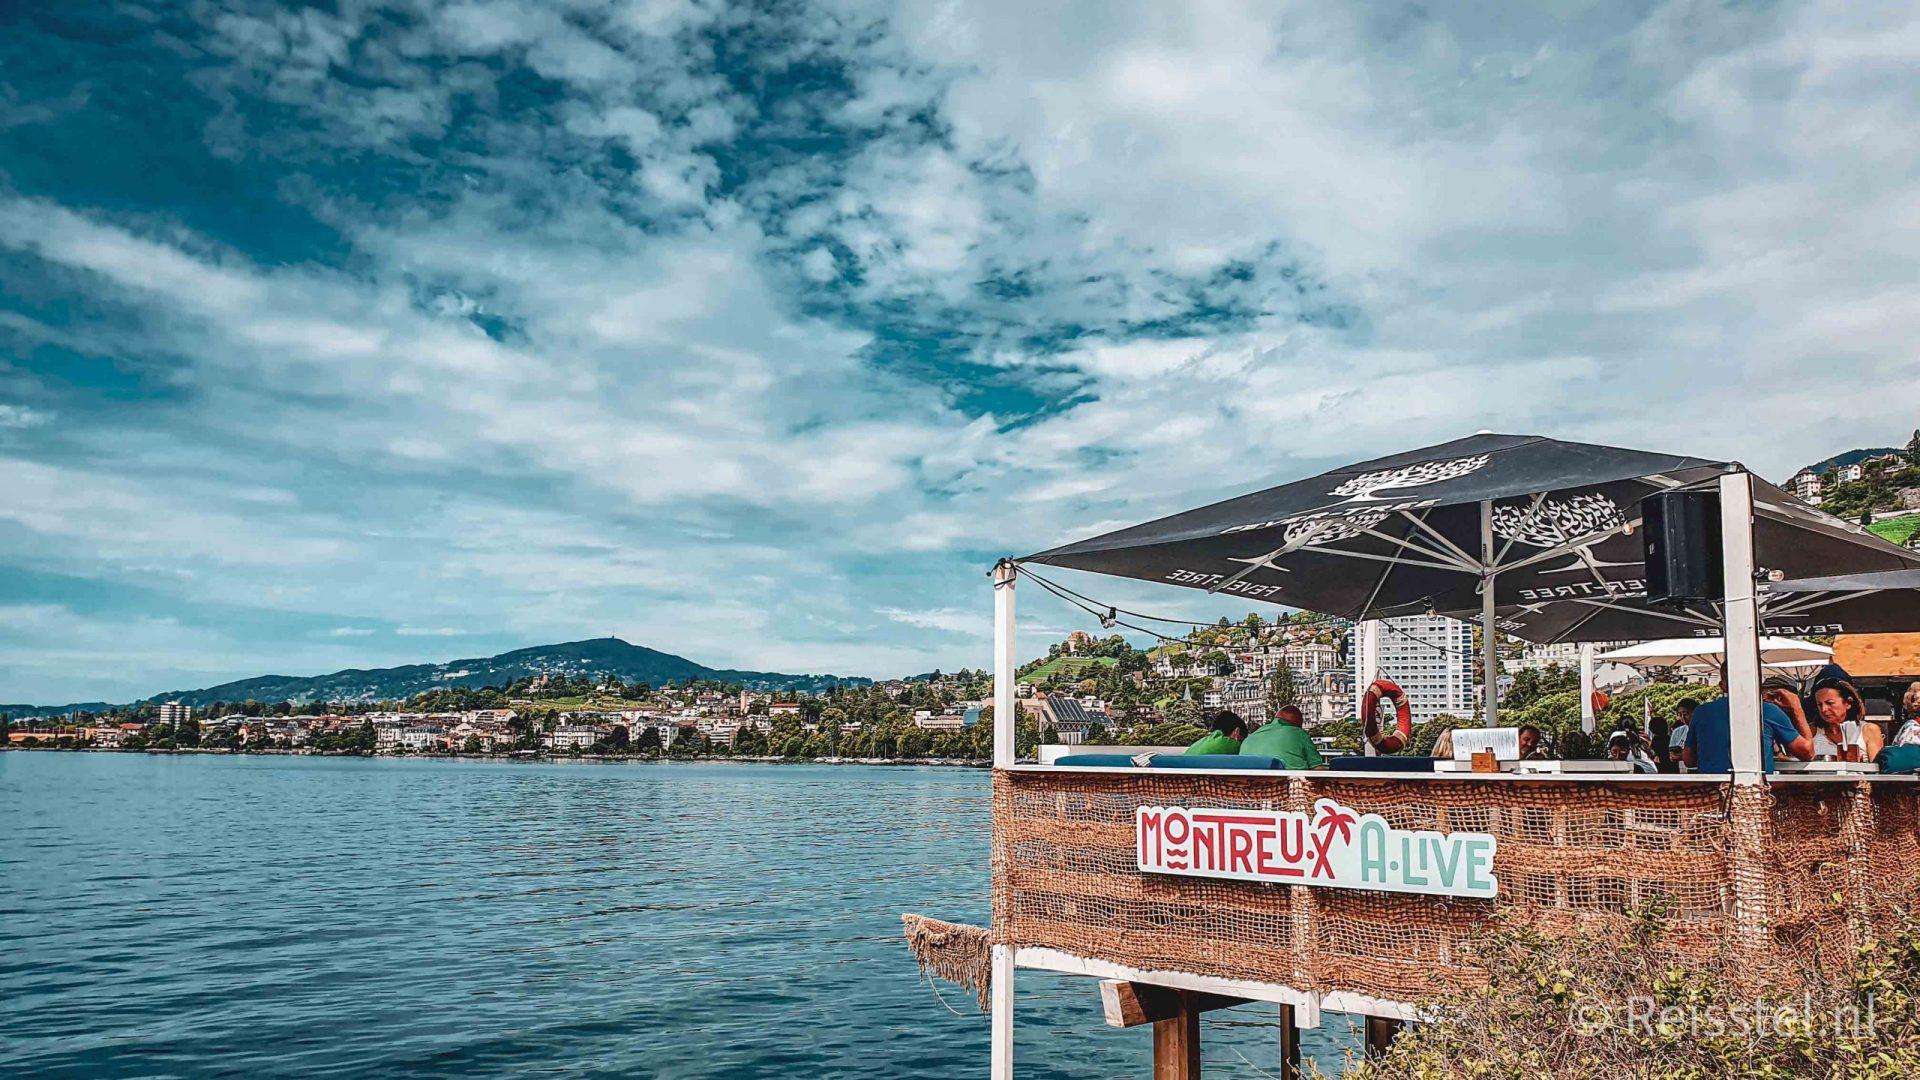 Bezienswaardigheden in Montreux - header